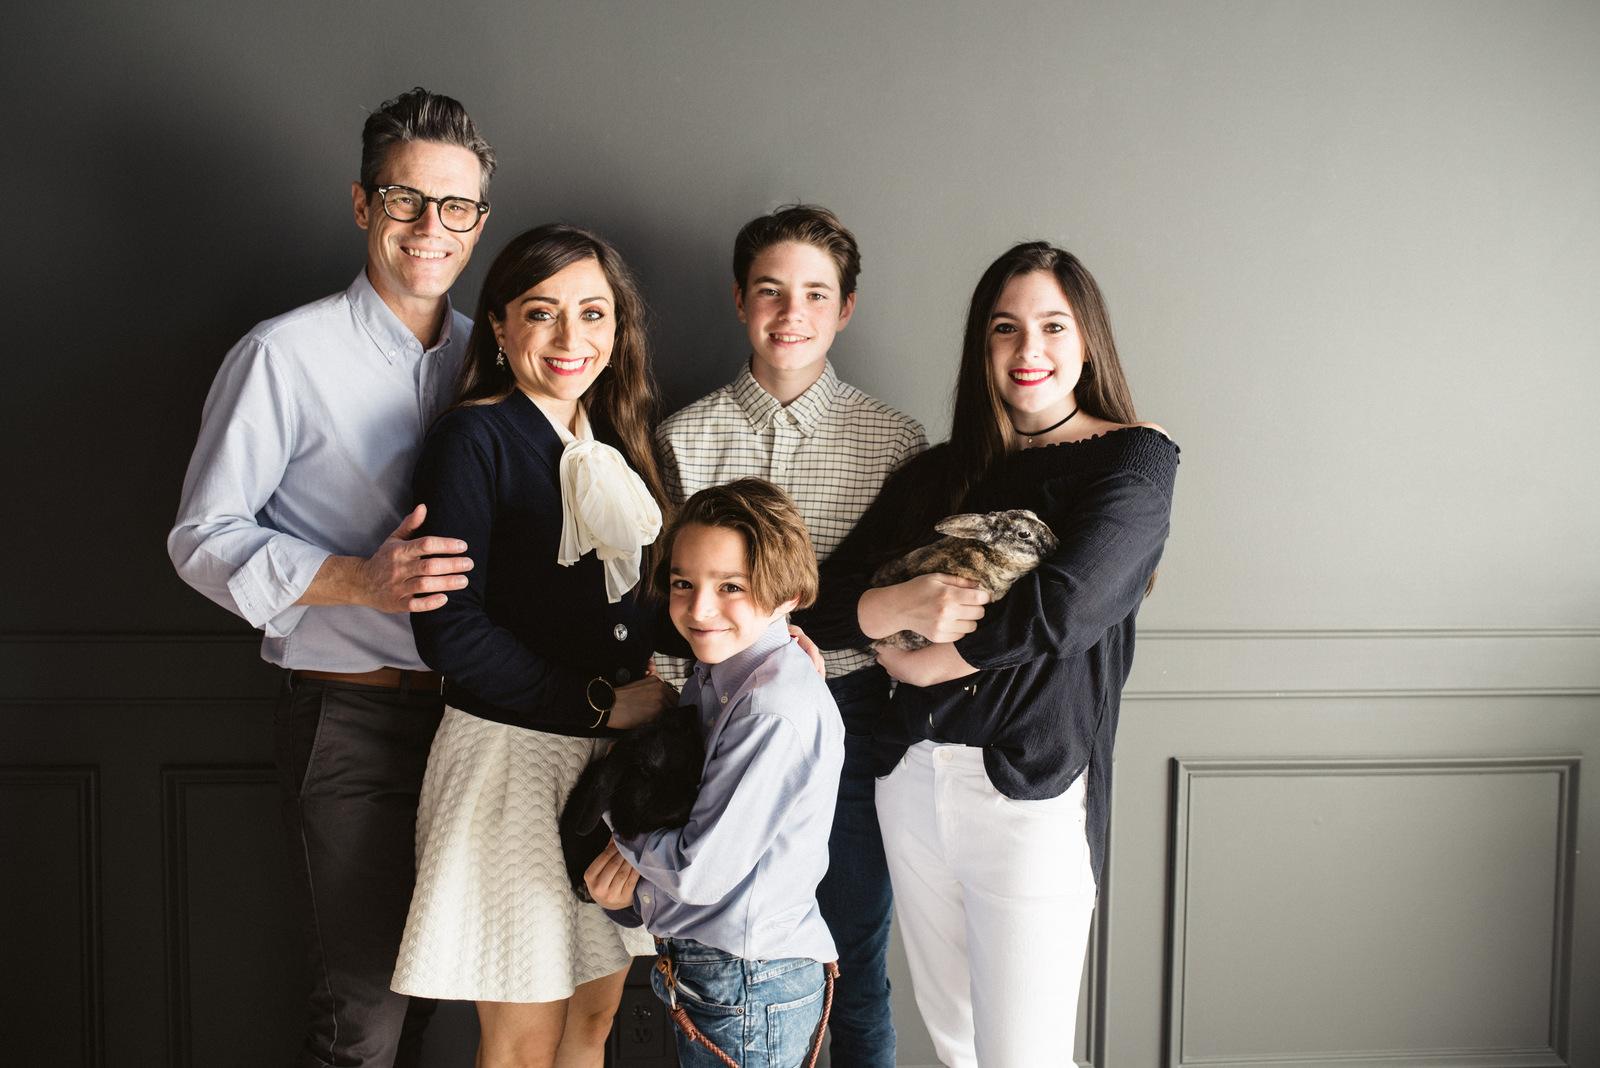 Family Easter Photos | House of Valentina-21.jpg